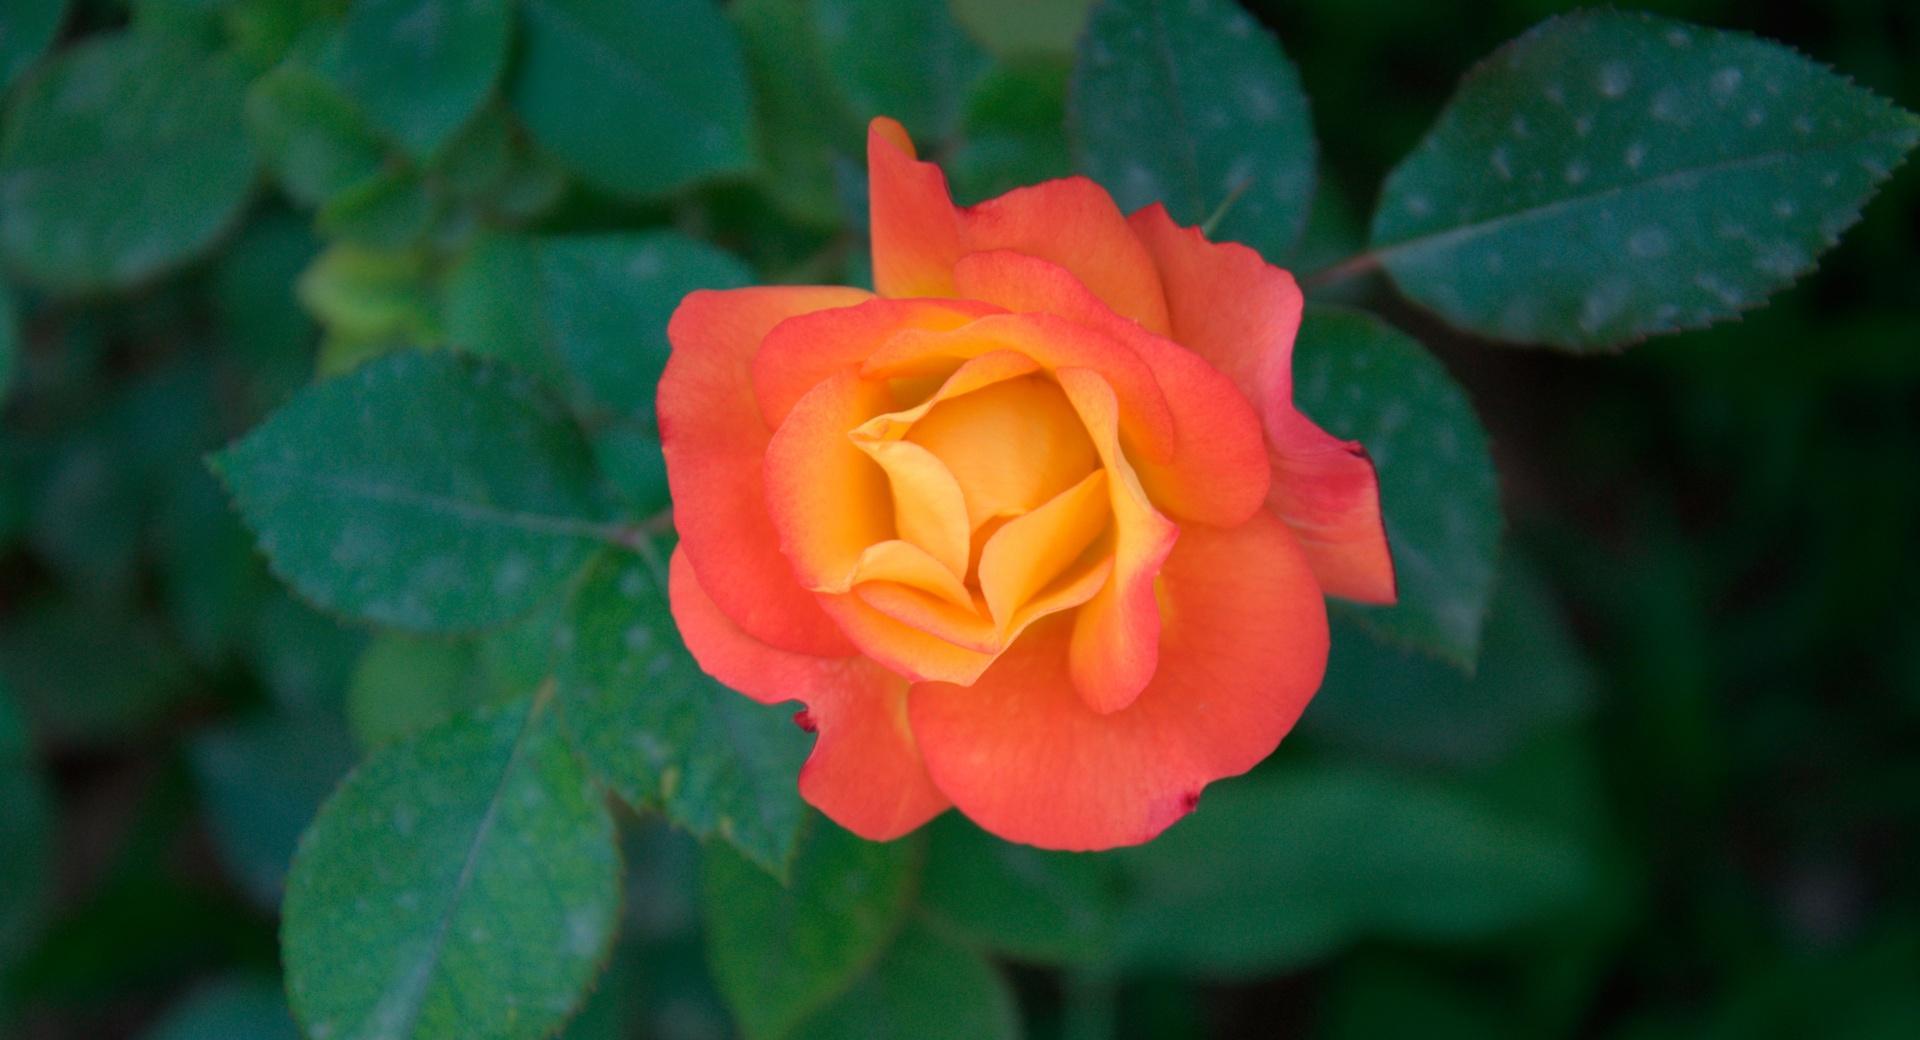 Orange Rose wallpapers HD quality